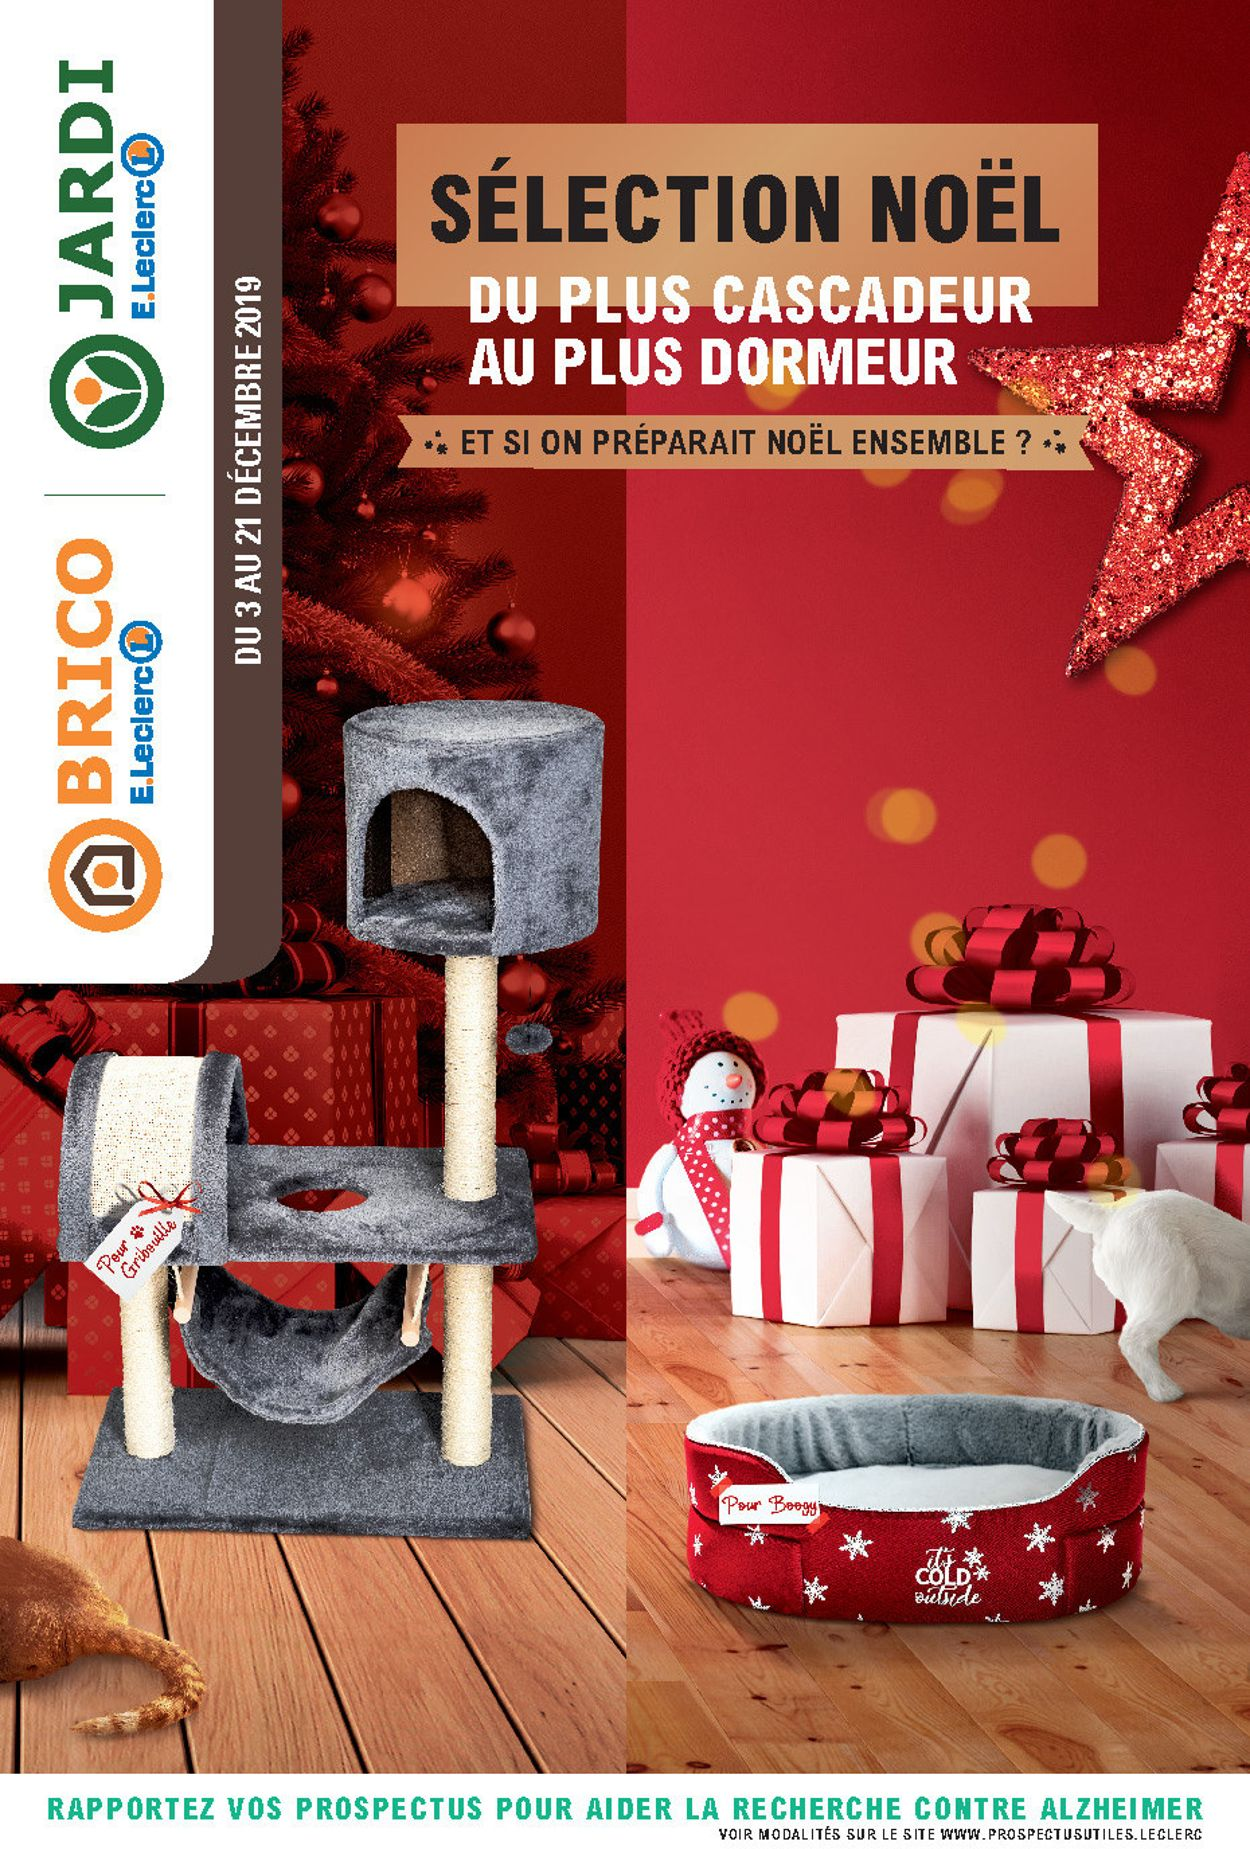 E.leclerc catalogue de Noël 2019 Catalogue - 03.12-21.12.2019